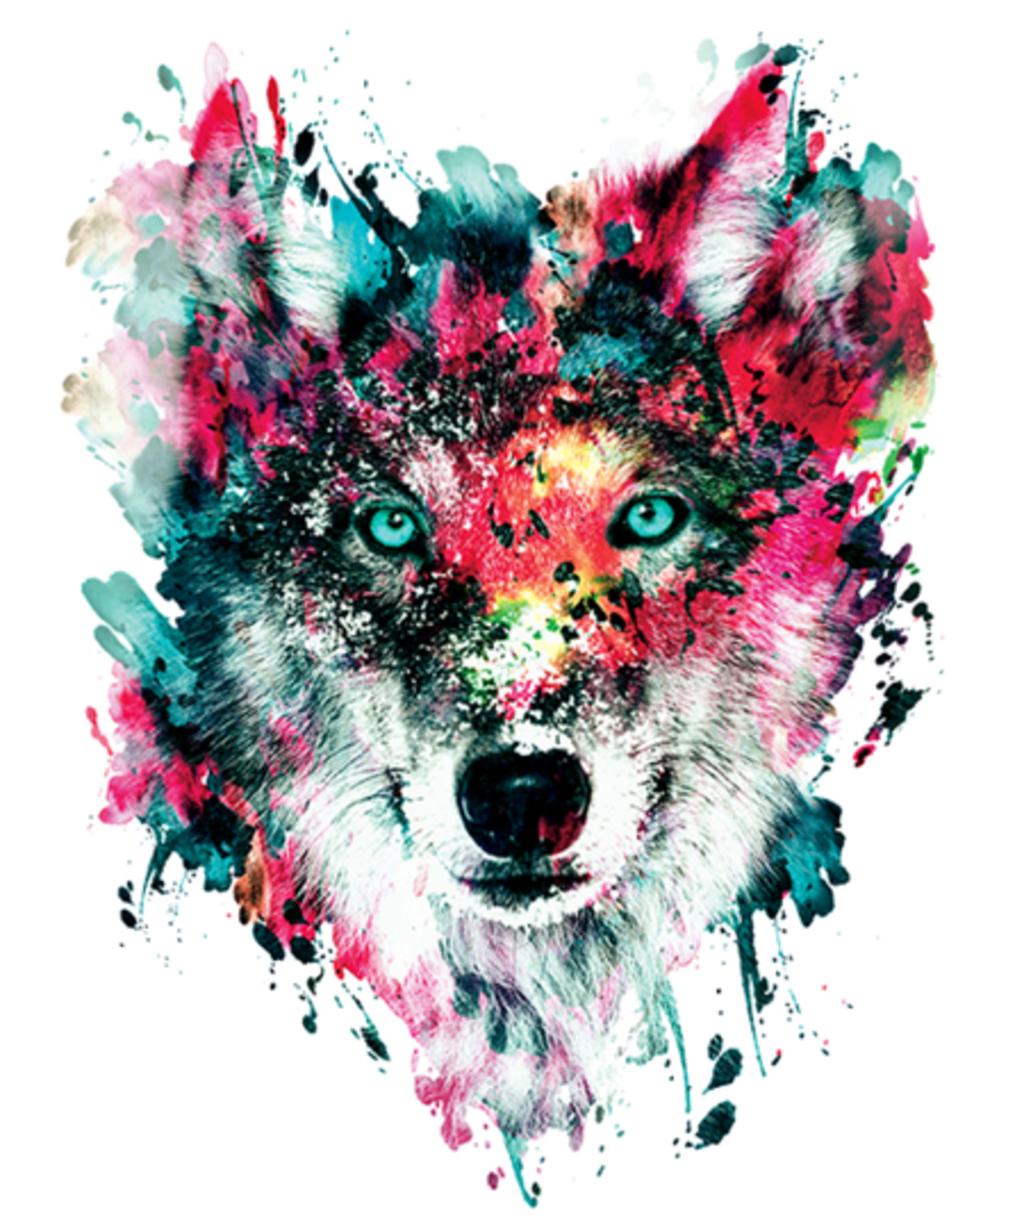 Qwertee: The Wolf